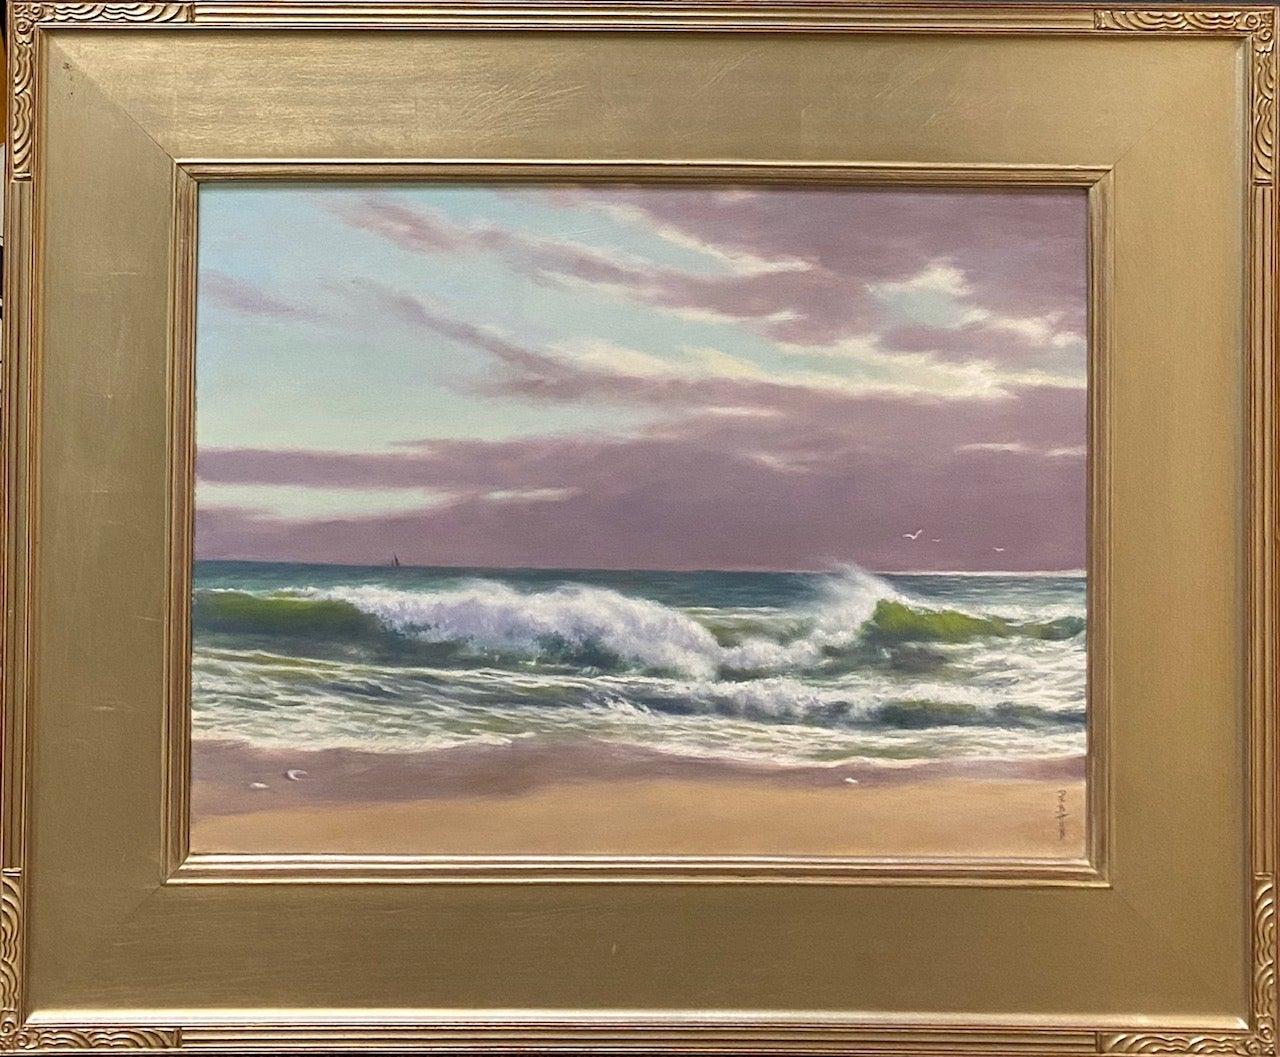 The Breakers, original 18x24 impressionist marine landscape